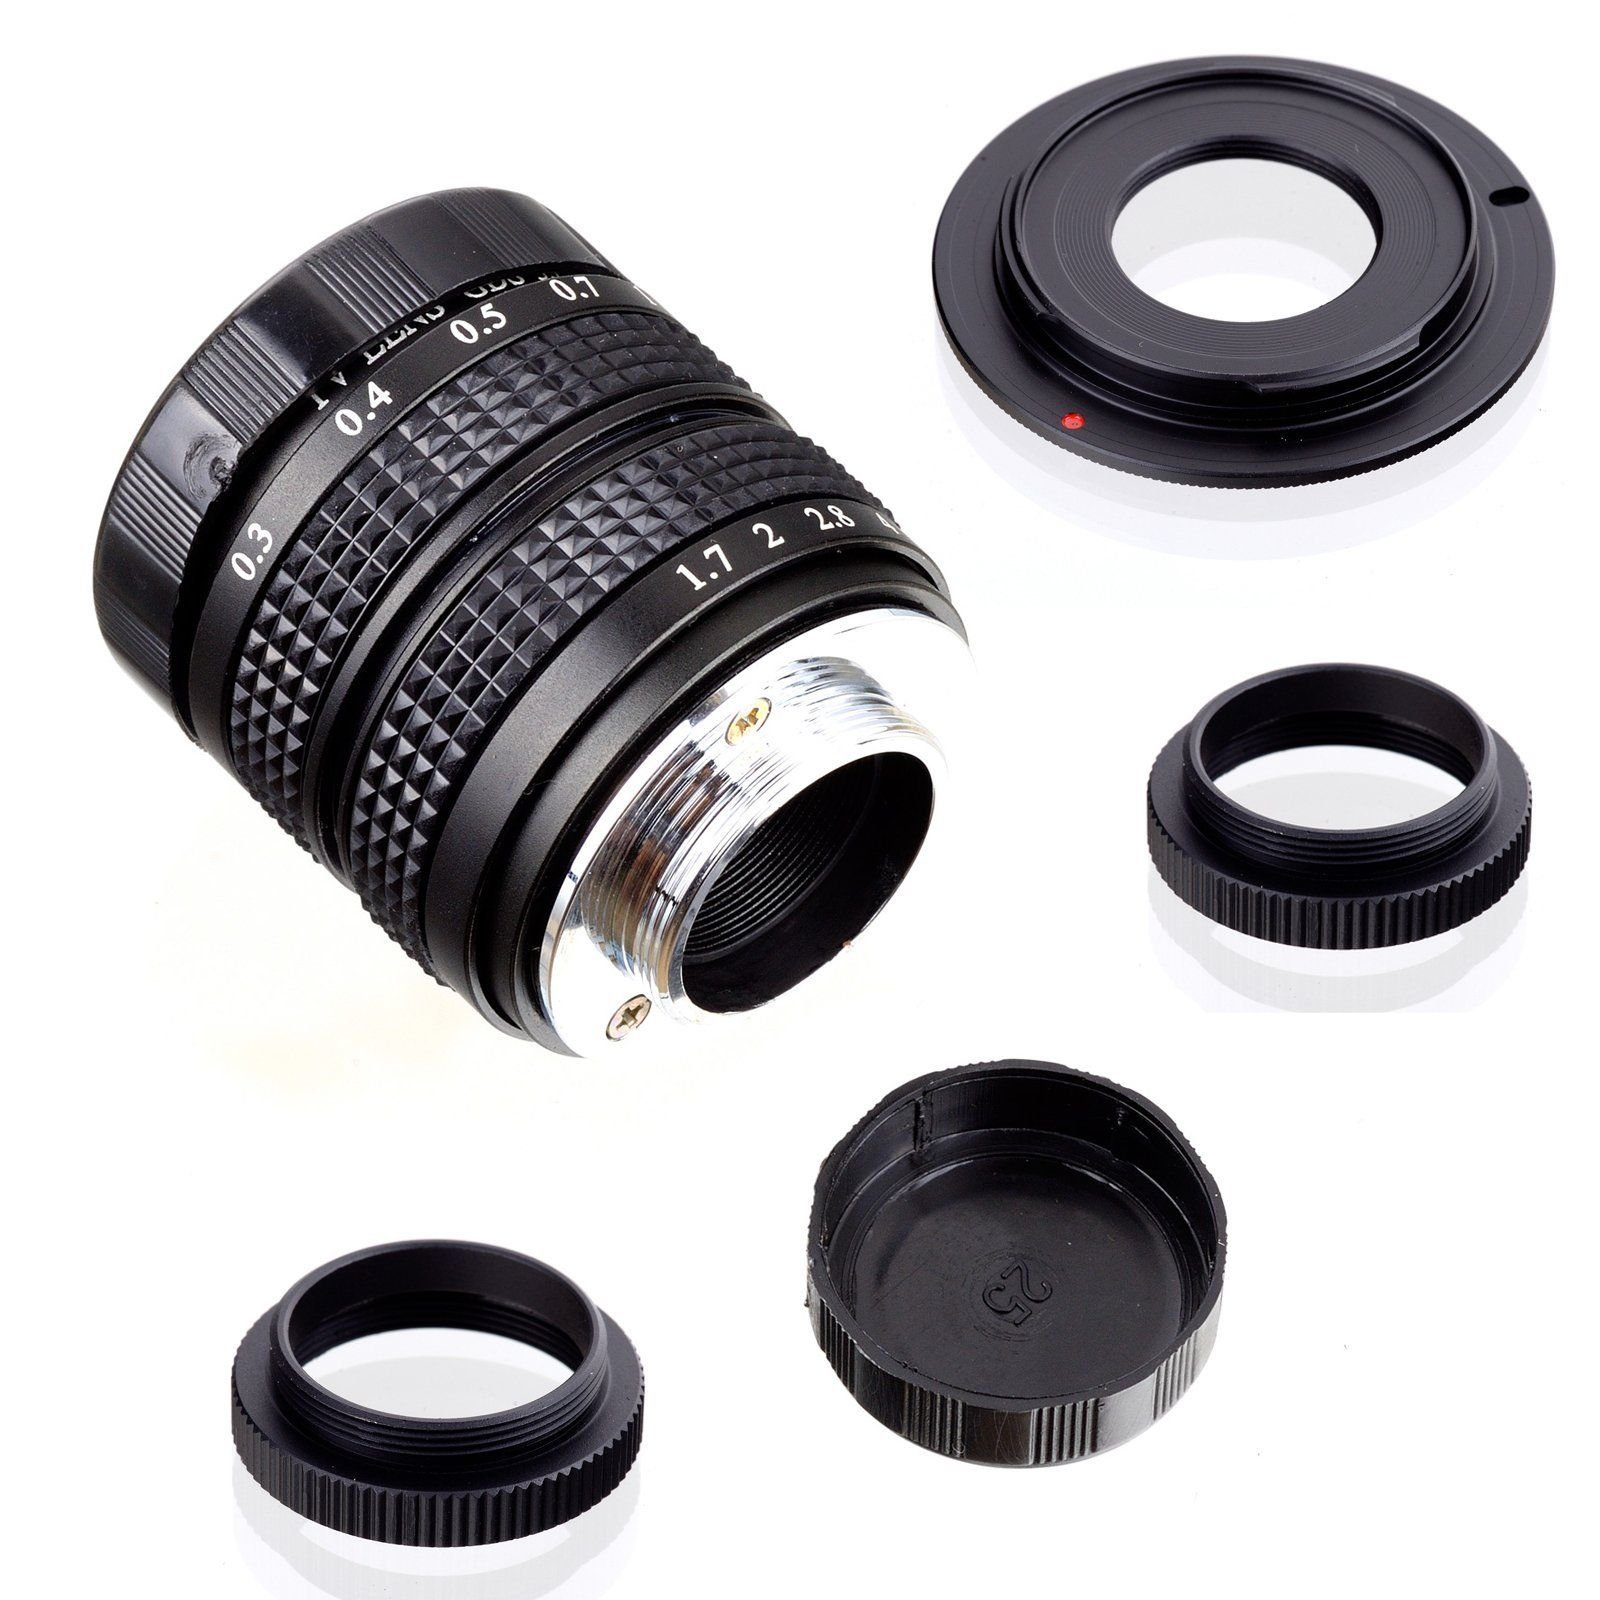 Fujian 35mm f/1.7 CCTV cine lens for Sony NEX E-mount camera & Adapter bundle for Sony NEX7 NEX-F3 a6000 a5000 a3500 by FUJIAN